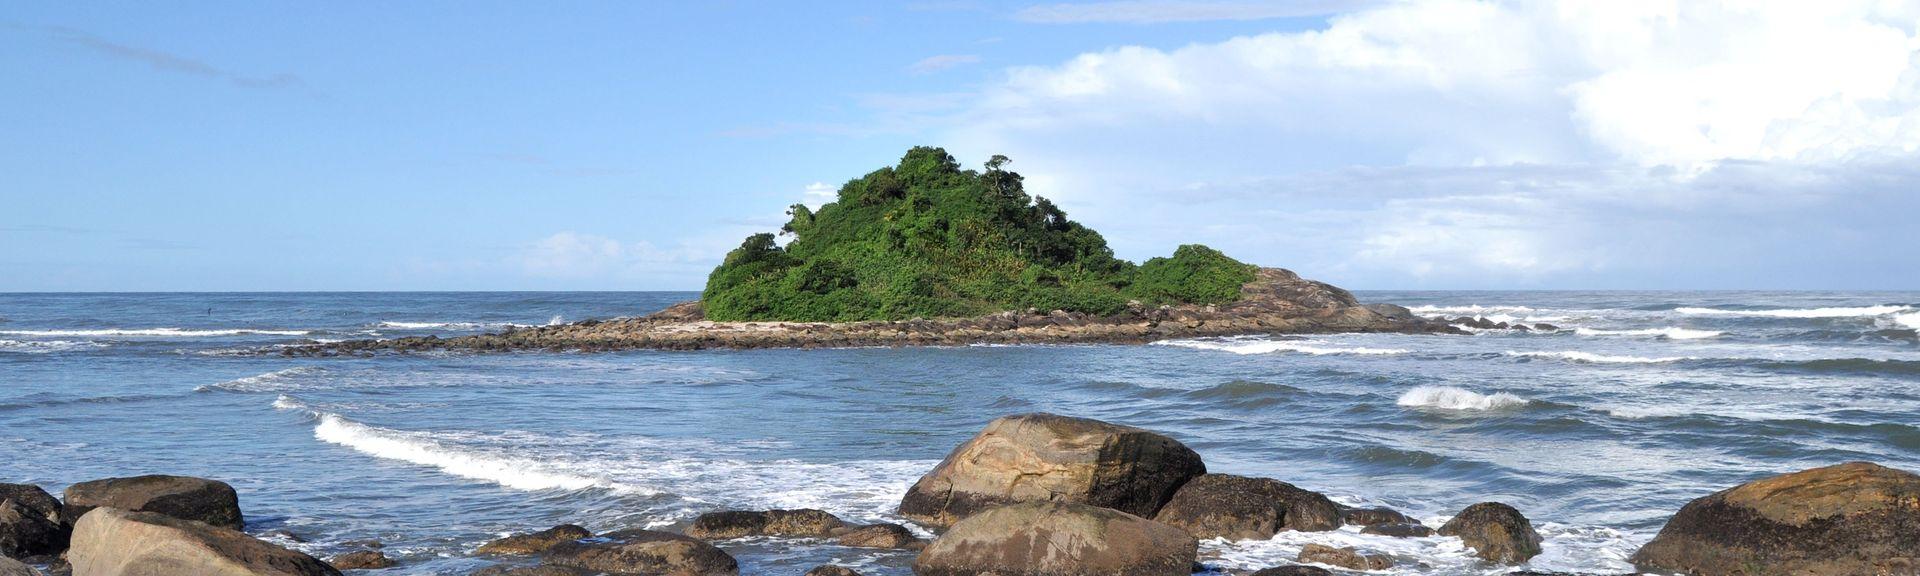 Mongaguá, Regione sudorientale, Brasile